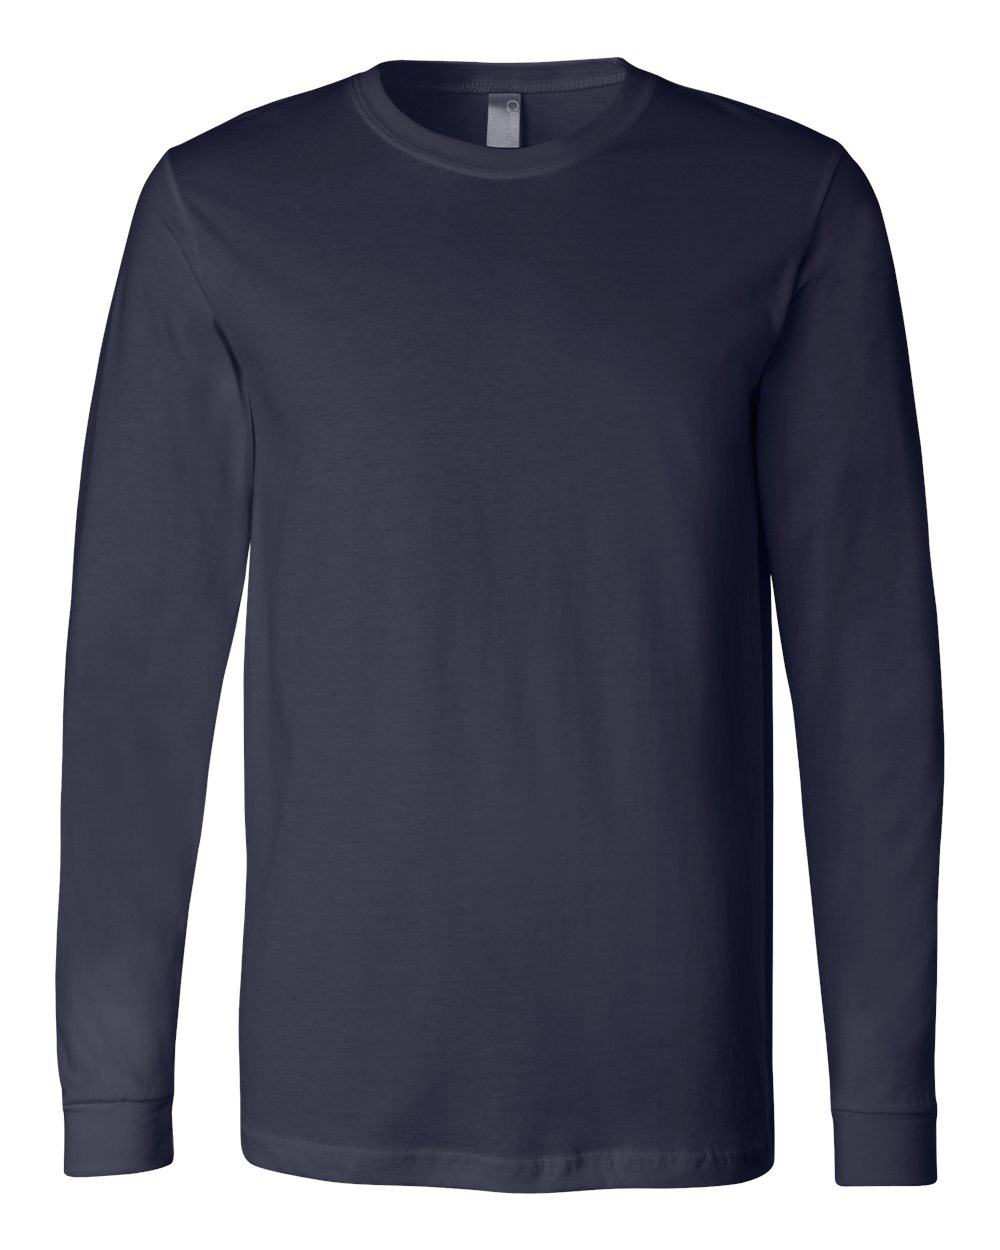 Bella-Canvas-Mens-Blank-Top-Long-Sleeve-Jersey-Tee-T-Shirt-3501-up-to-3XL thumbnail 88